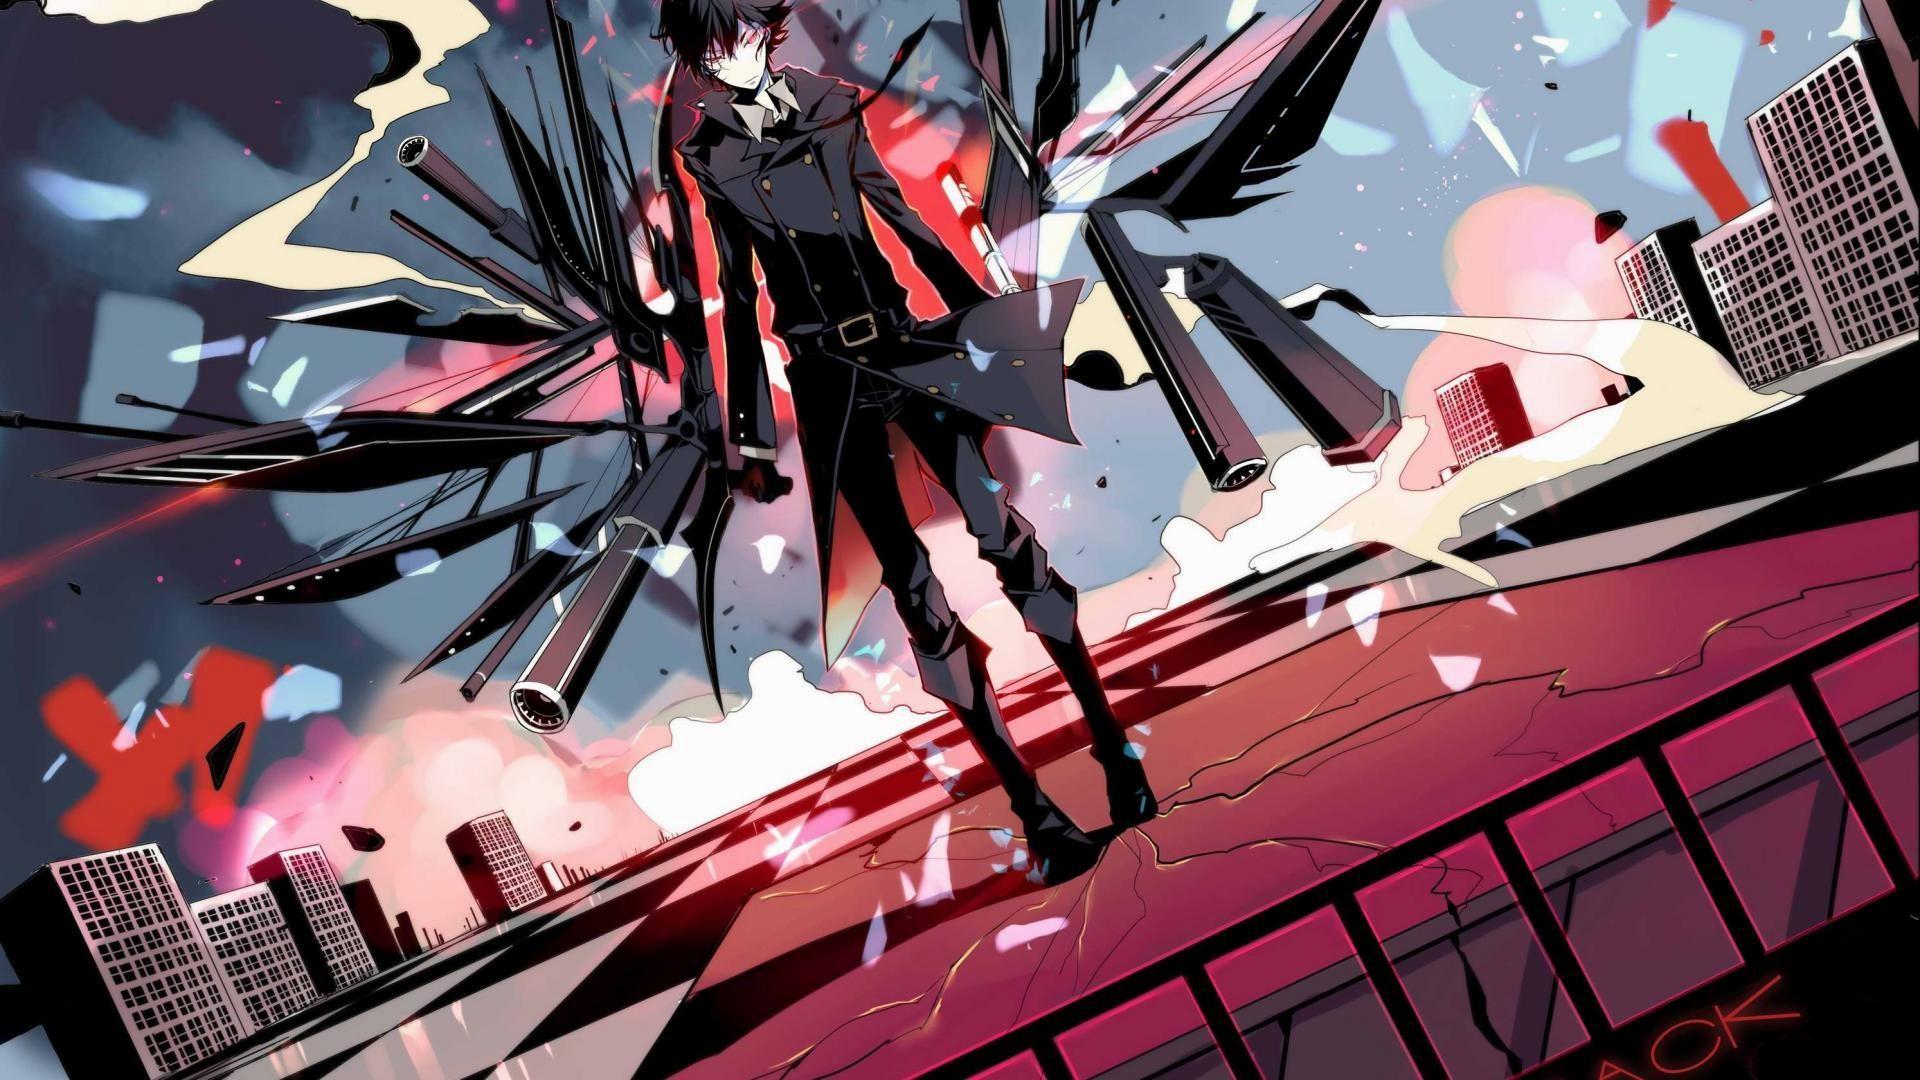 wallpaper.wiki-Badass-Anime-Wallpaper-Full-HD-PIC-